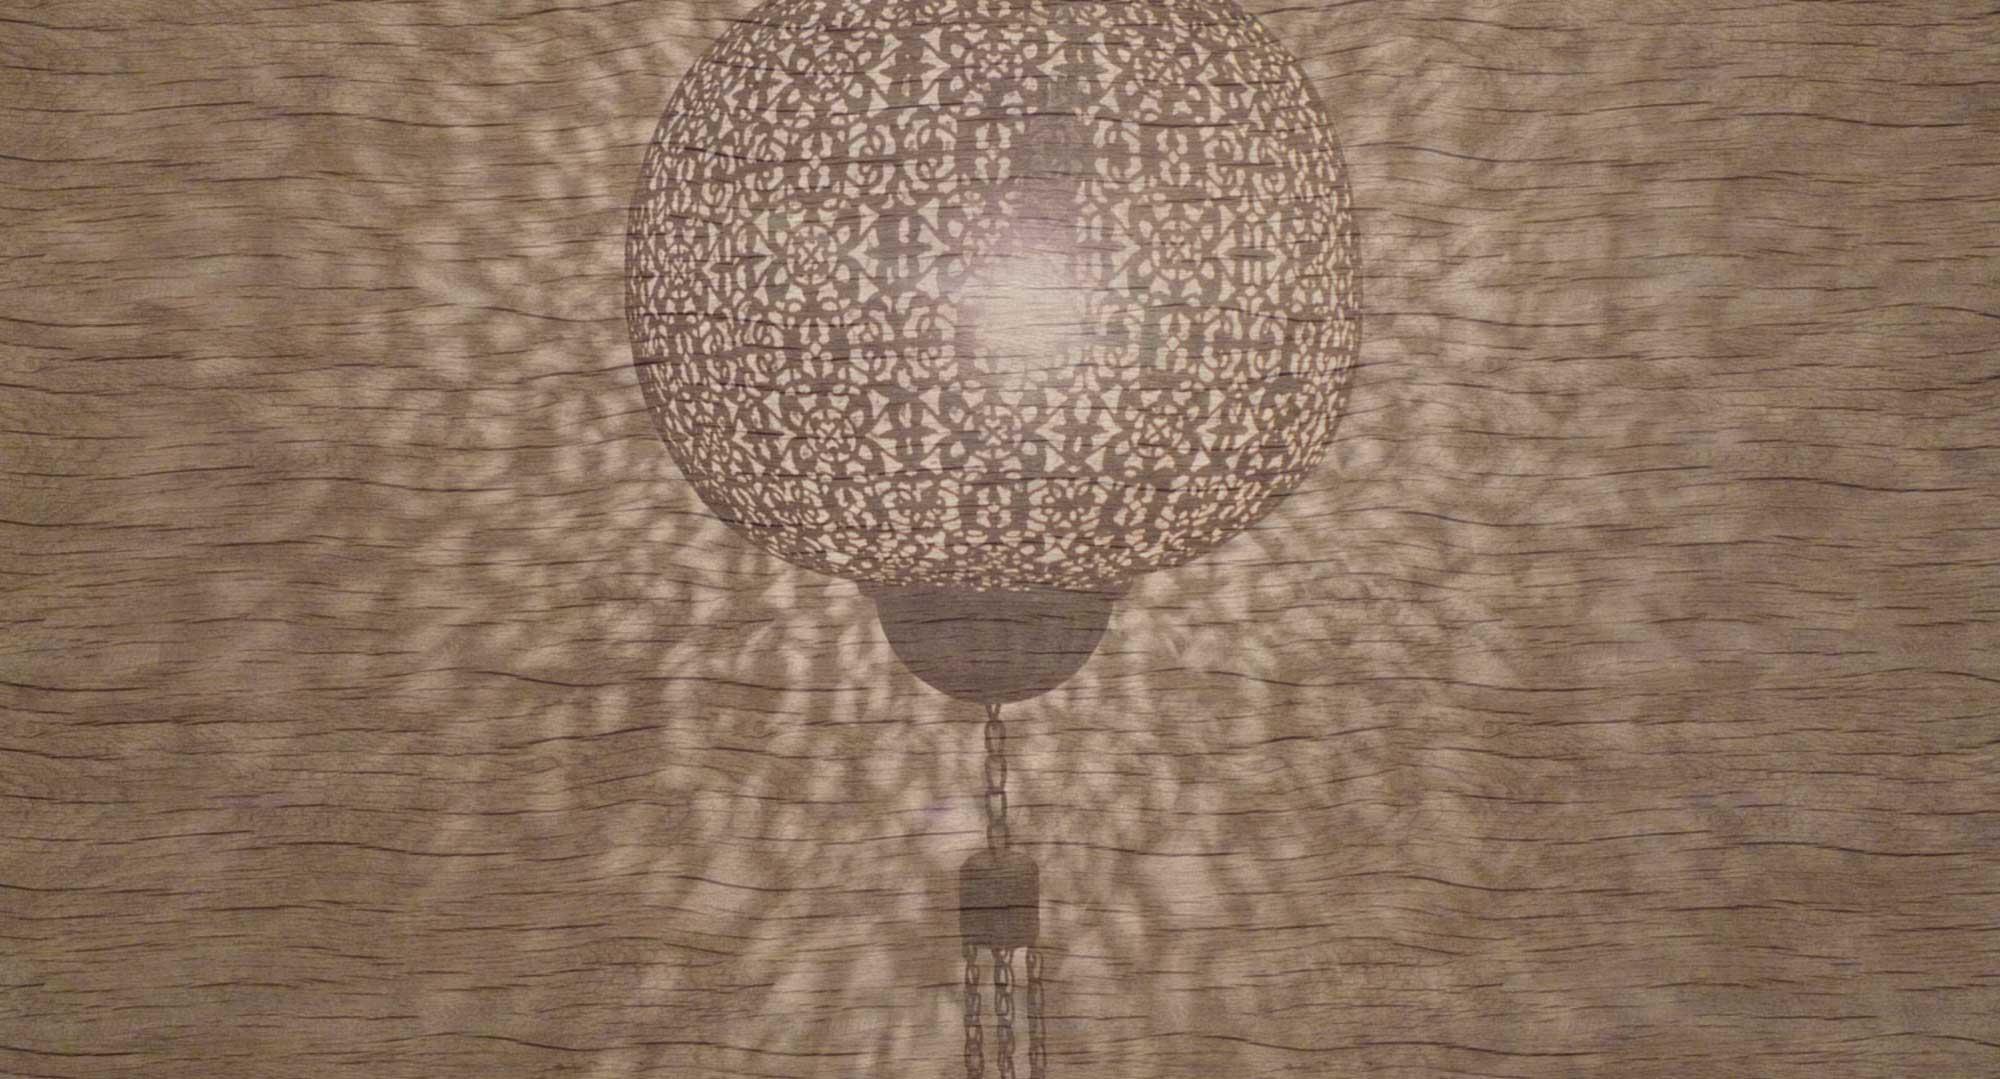 Marokkaanse Lampen Xenos : Oosterse lampen kopen in de webshop glasmozaiek en filigrain